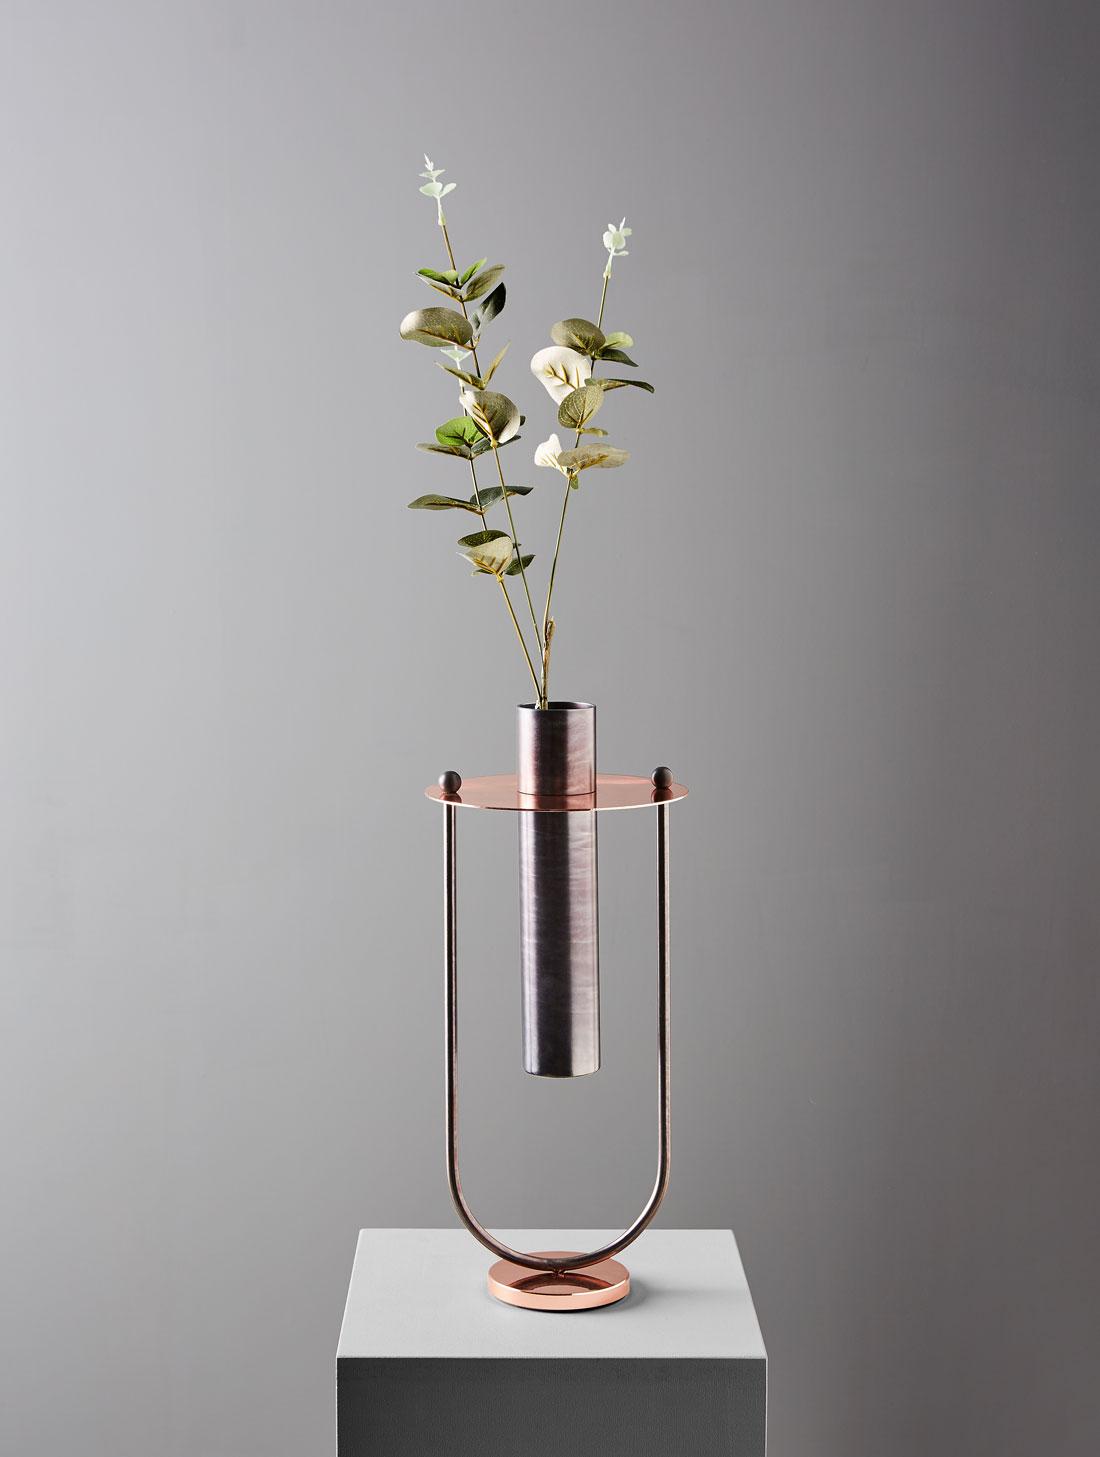 Vase_product design_Federica Biasi_Brass